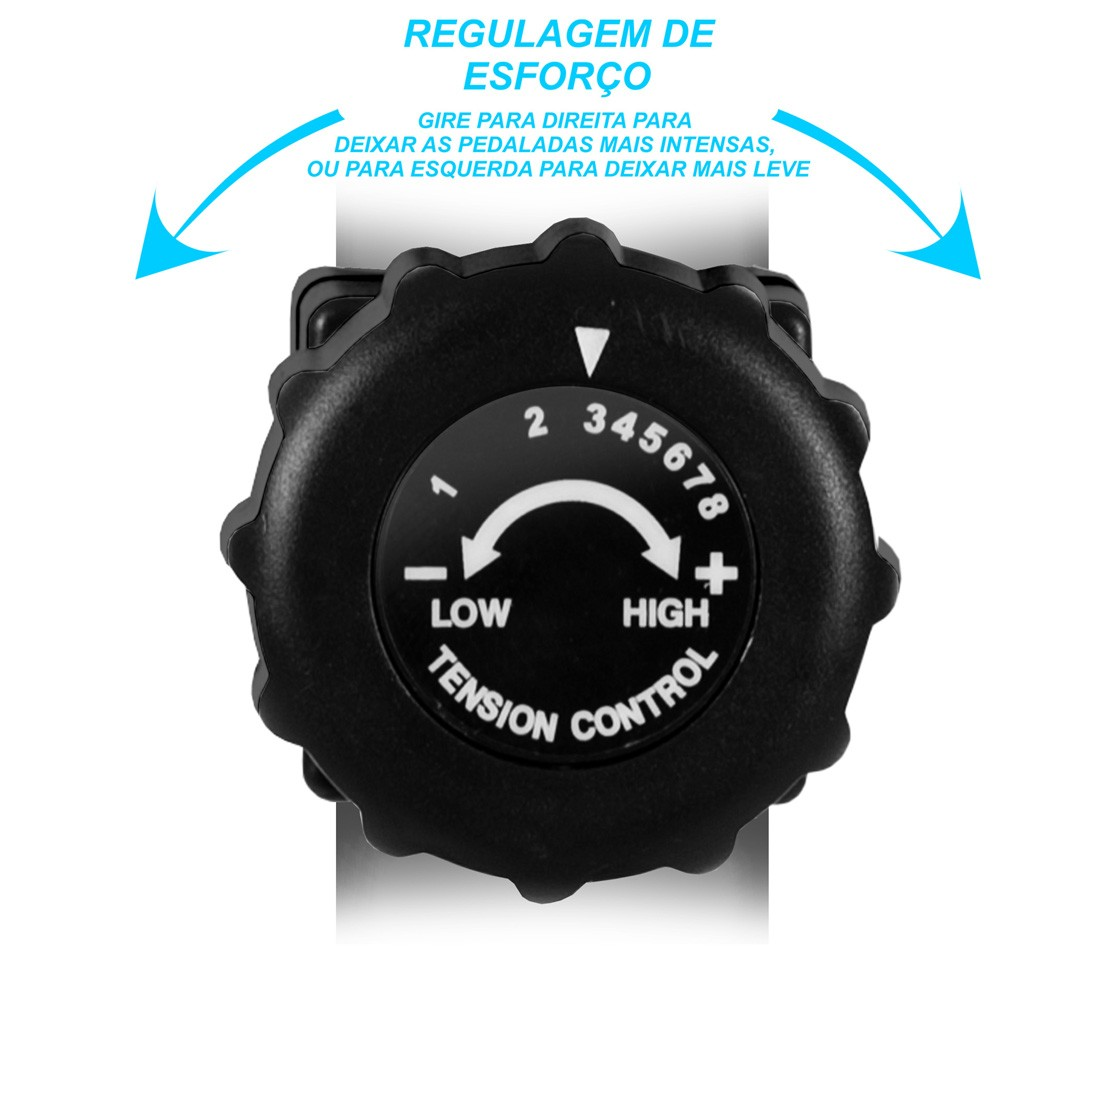 Elíptico Bike Podiumfit Eb100 Magnético 8cargas Max120kg